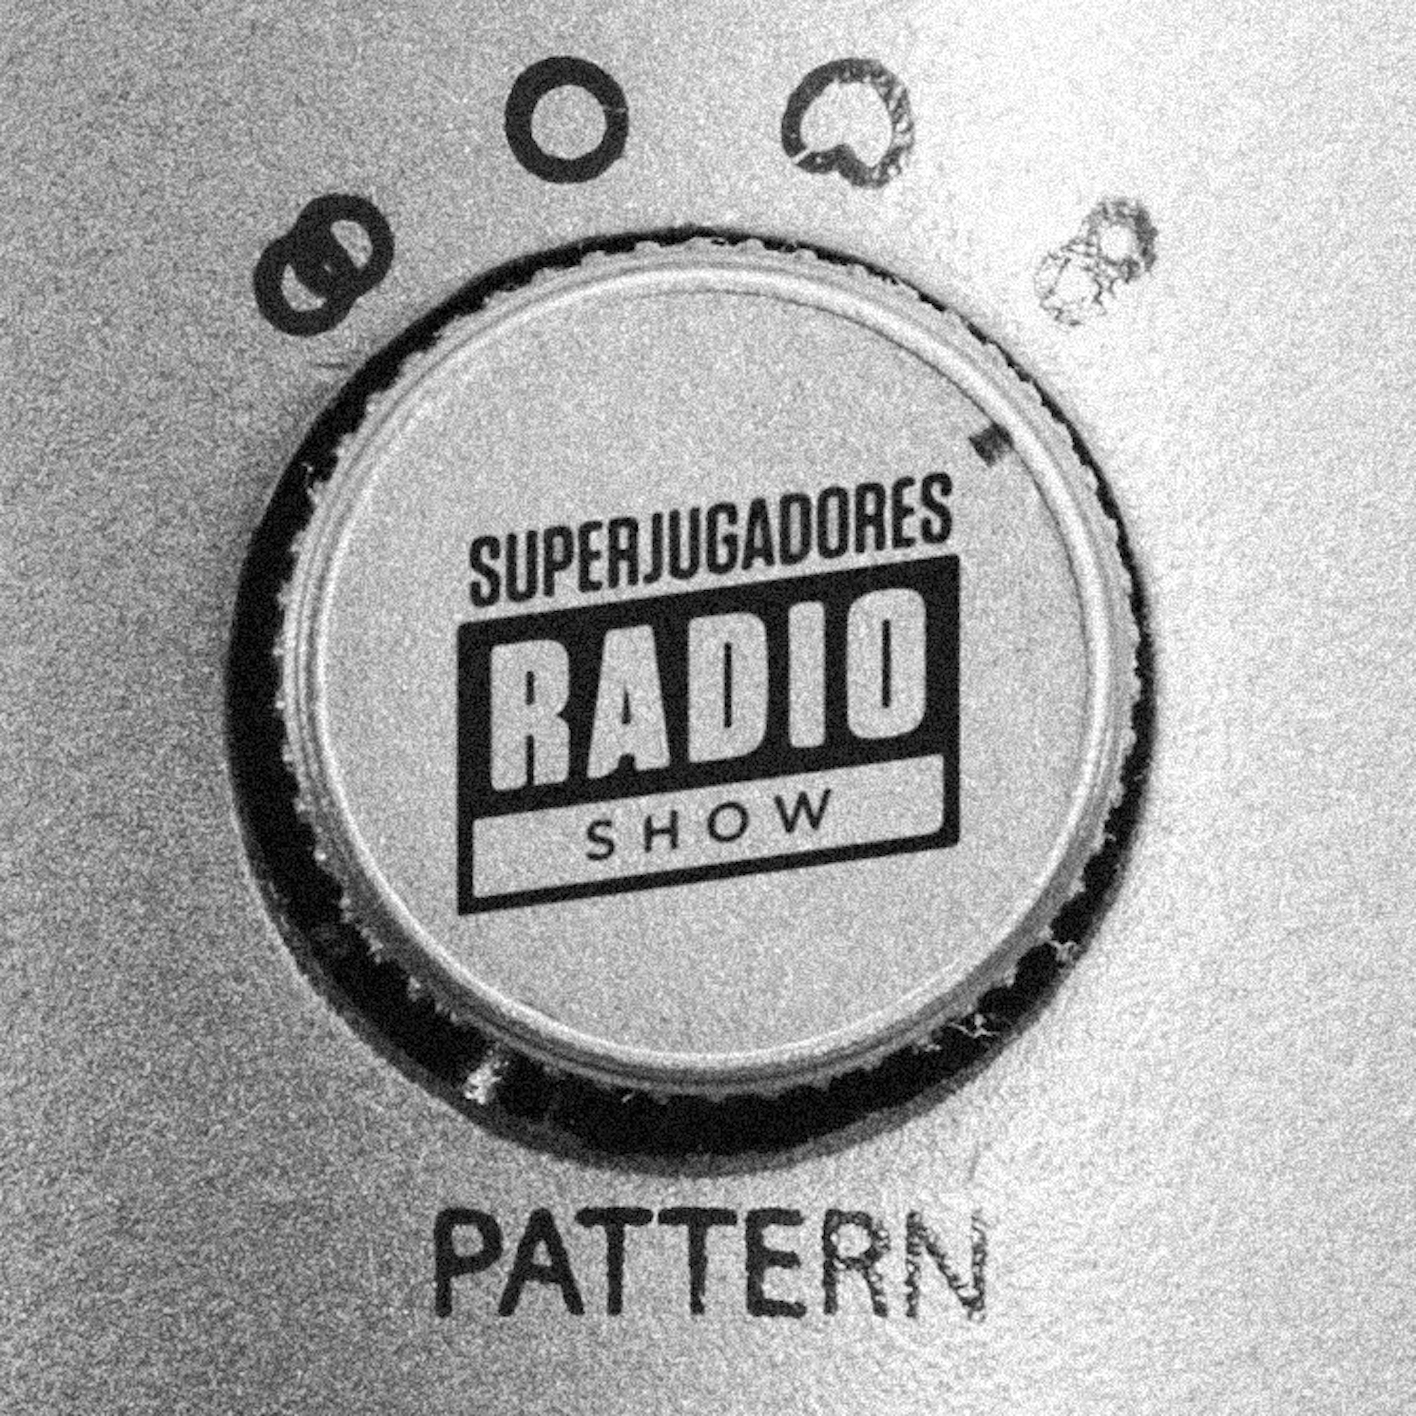 Superjugadores Radio Show